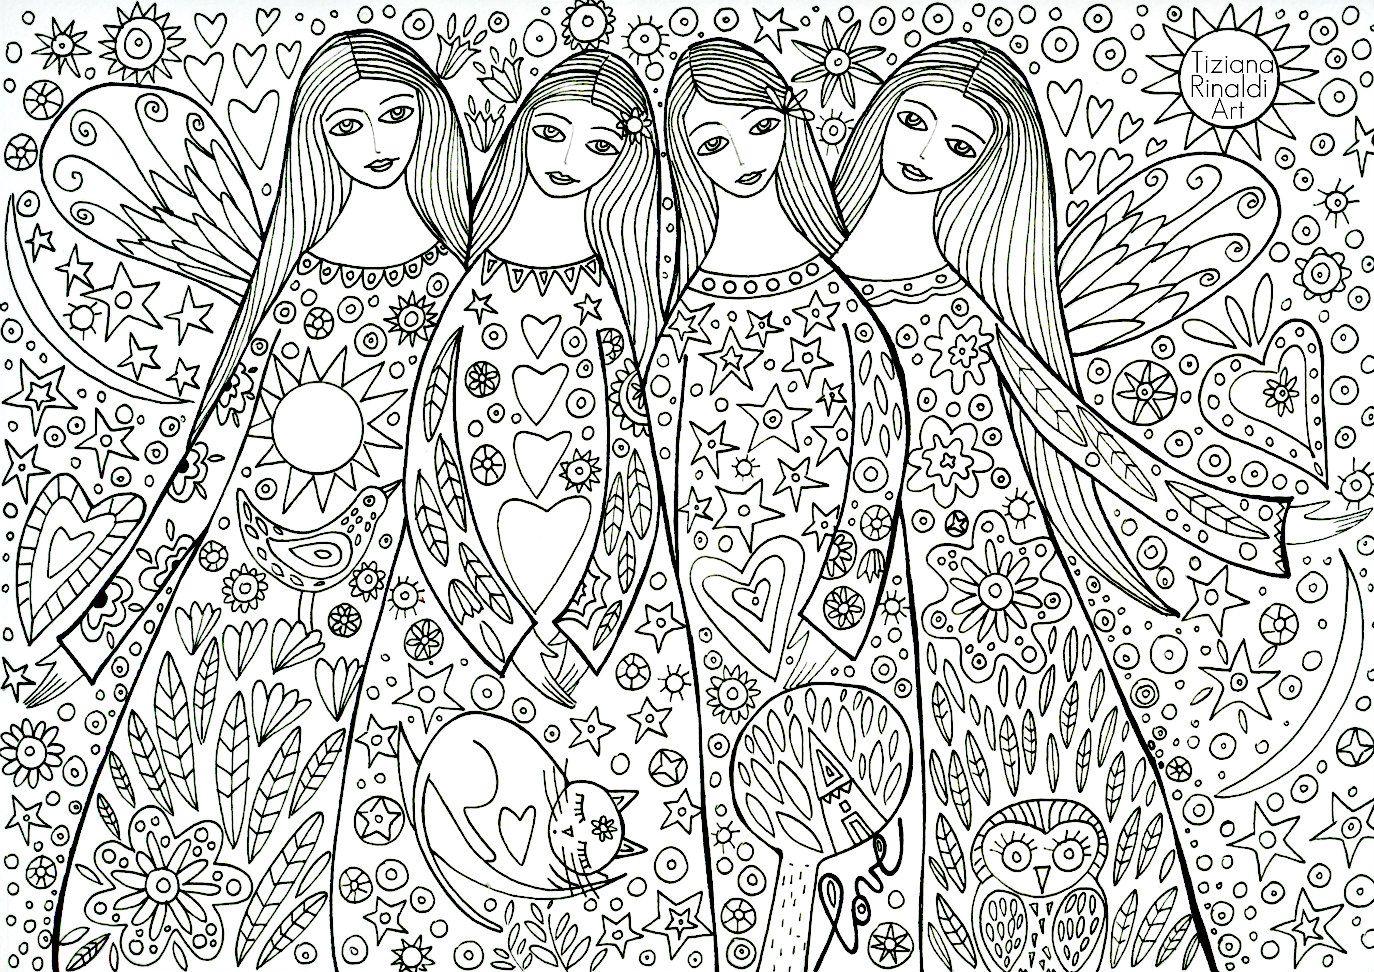 disegni a matita spettacolari